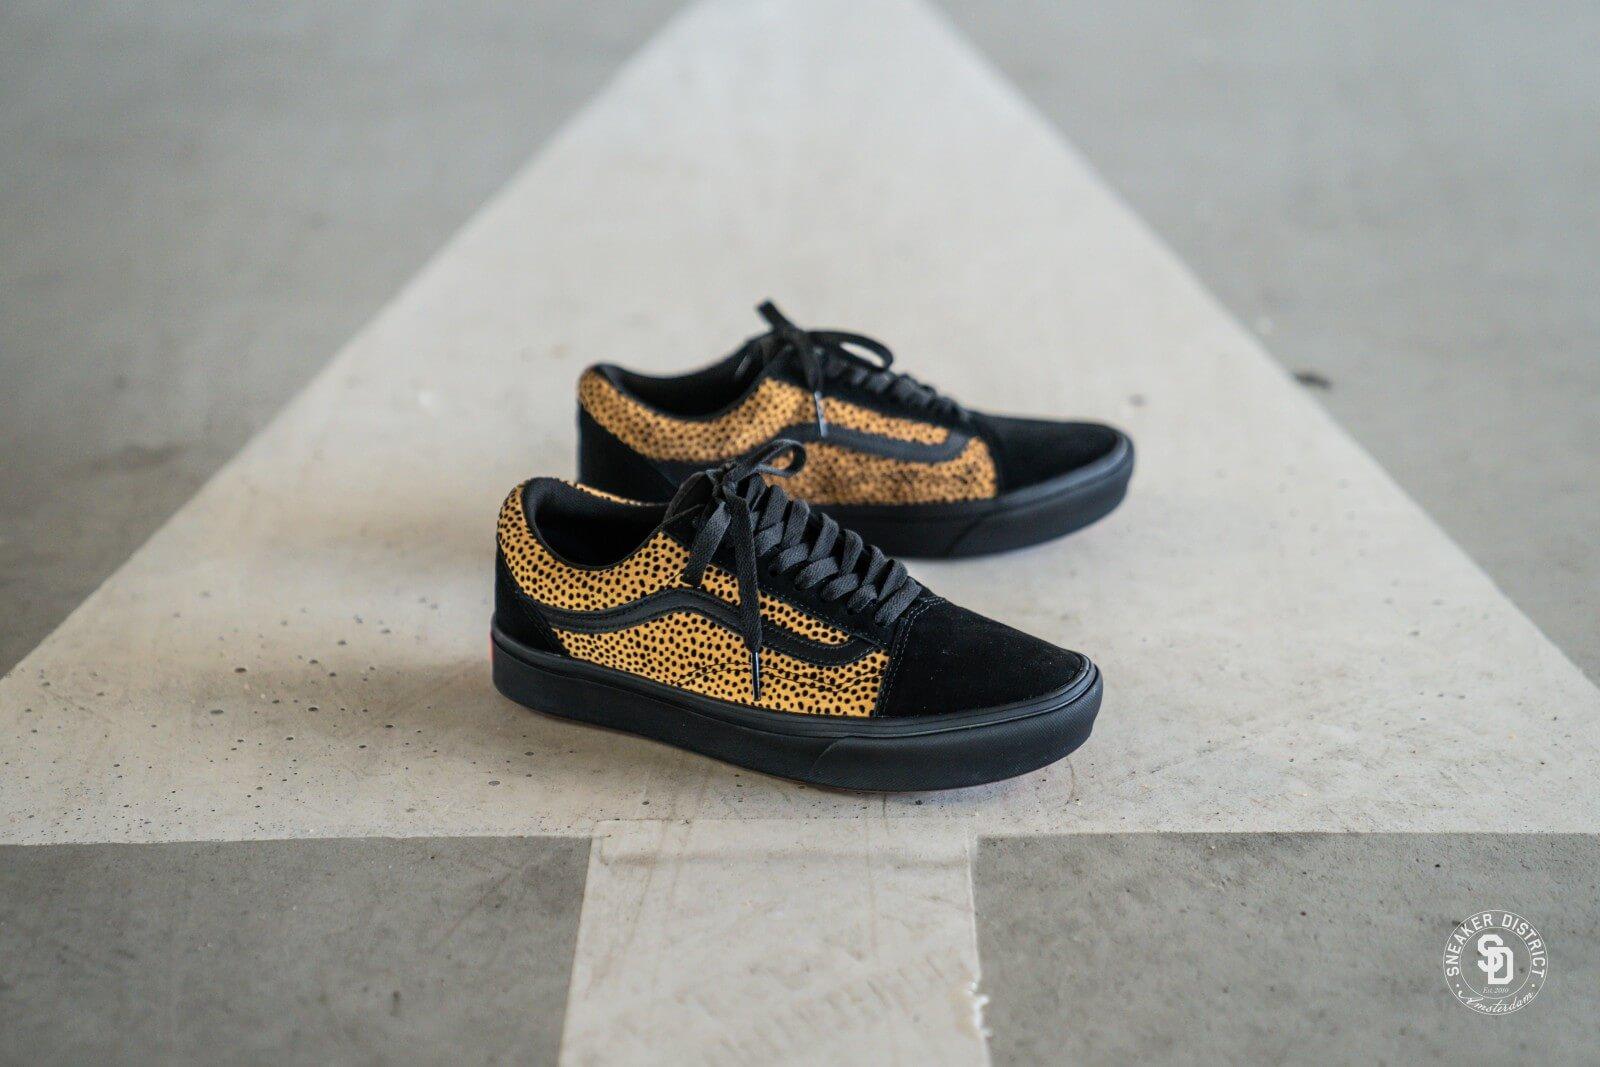 Vans Comfycush Old Skool Tiny Cheetah Black VN0A3WMAVWS1